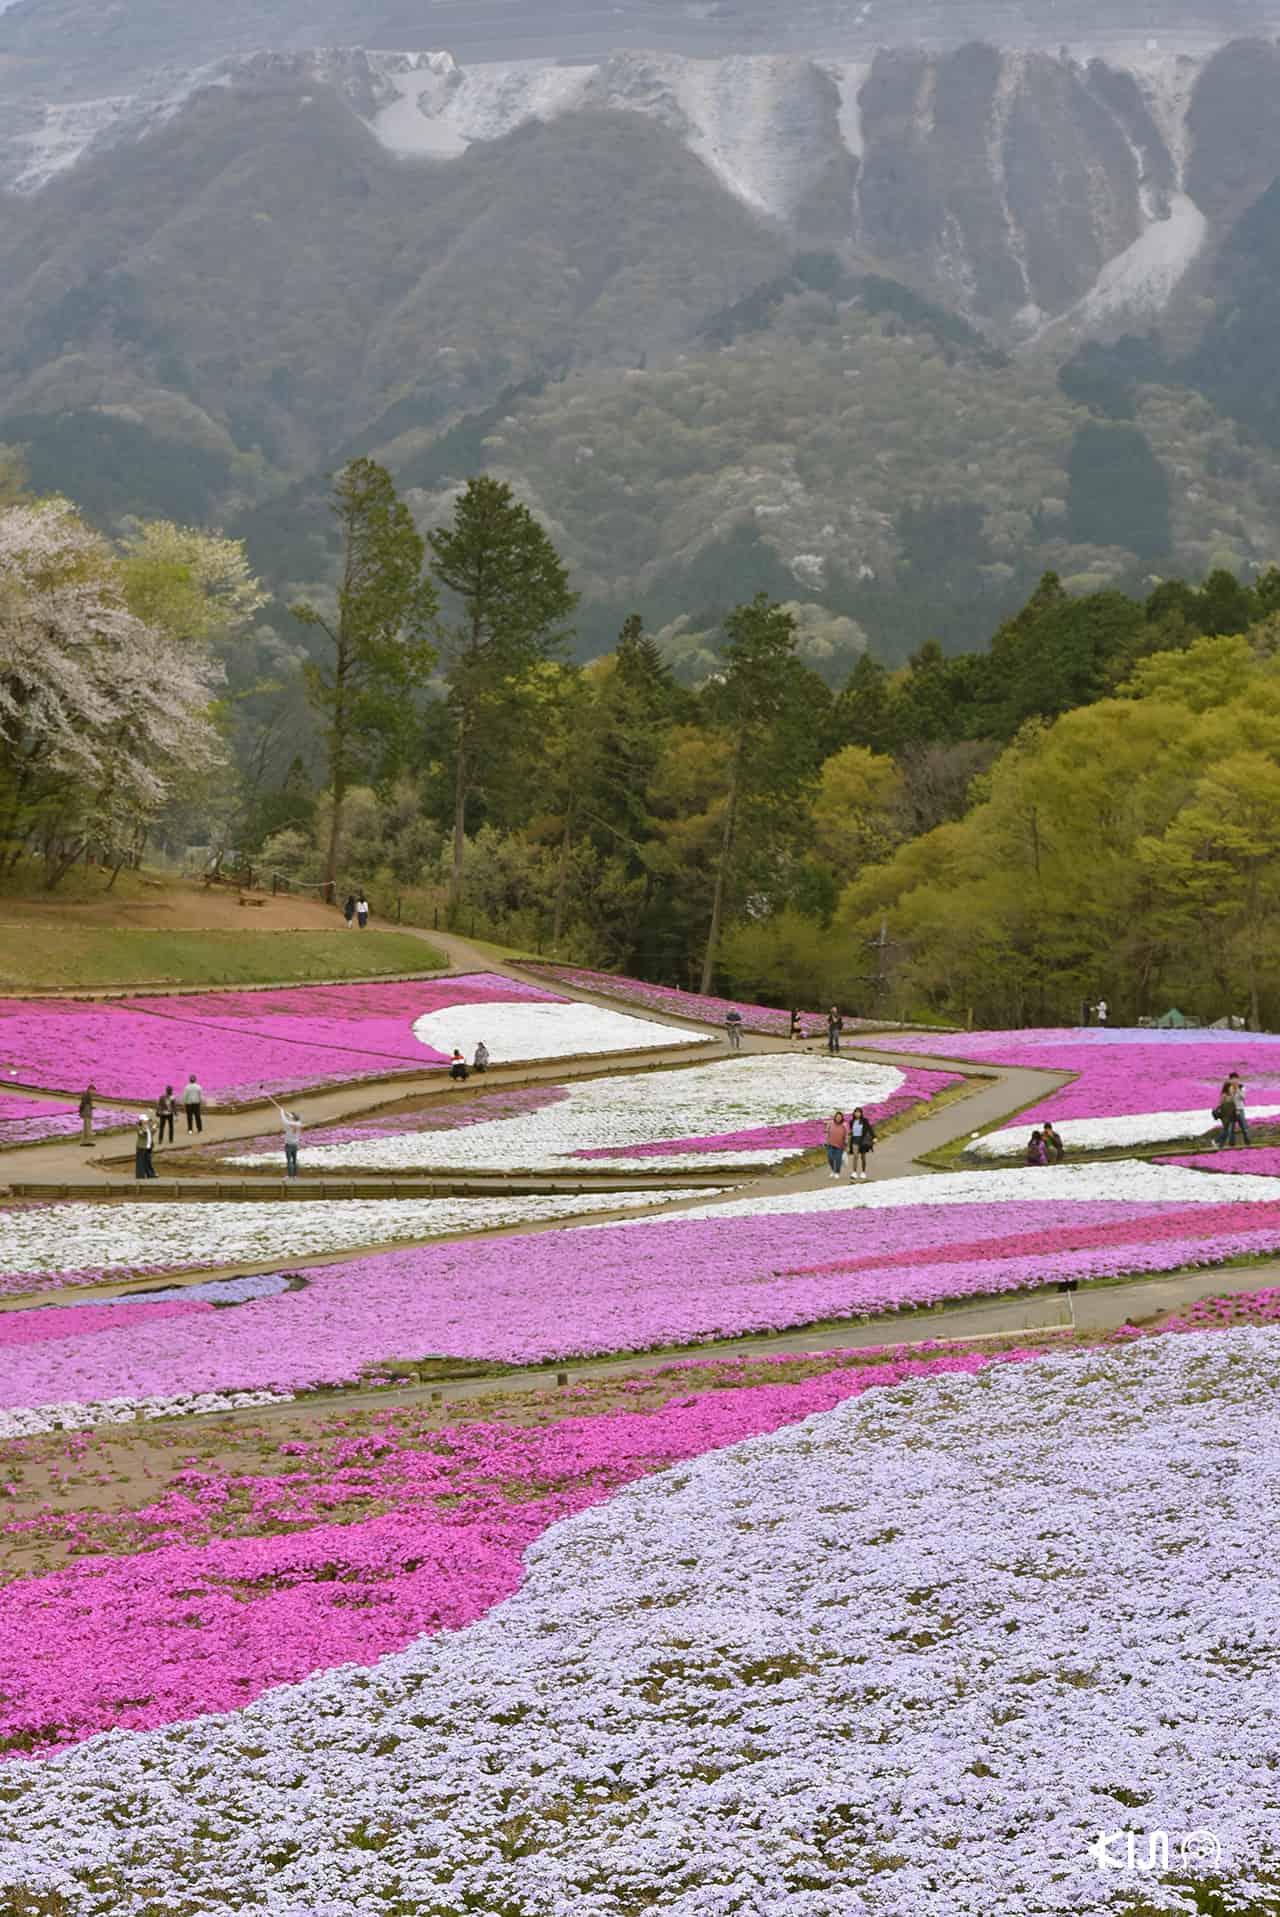 Shibazakura no oka (芝桜の丘) เนินดอกชิบะซากุระในสวนฮิสึจิยามะ (Hitsujiyama Park)